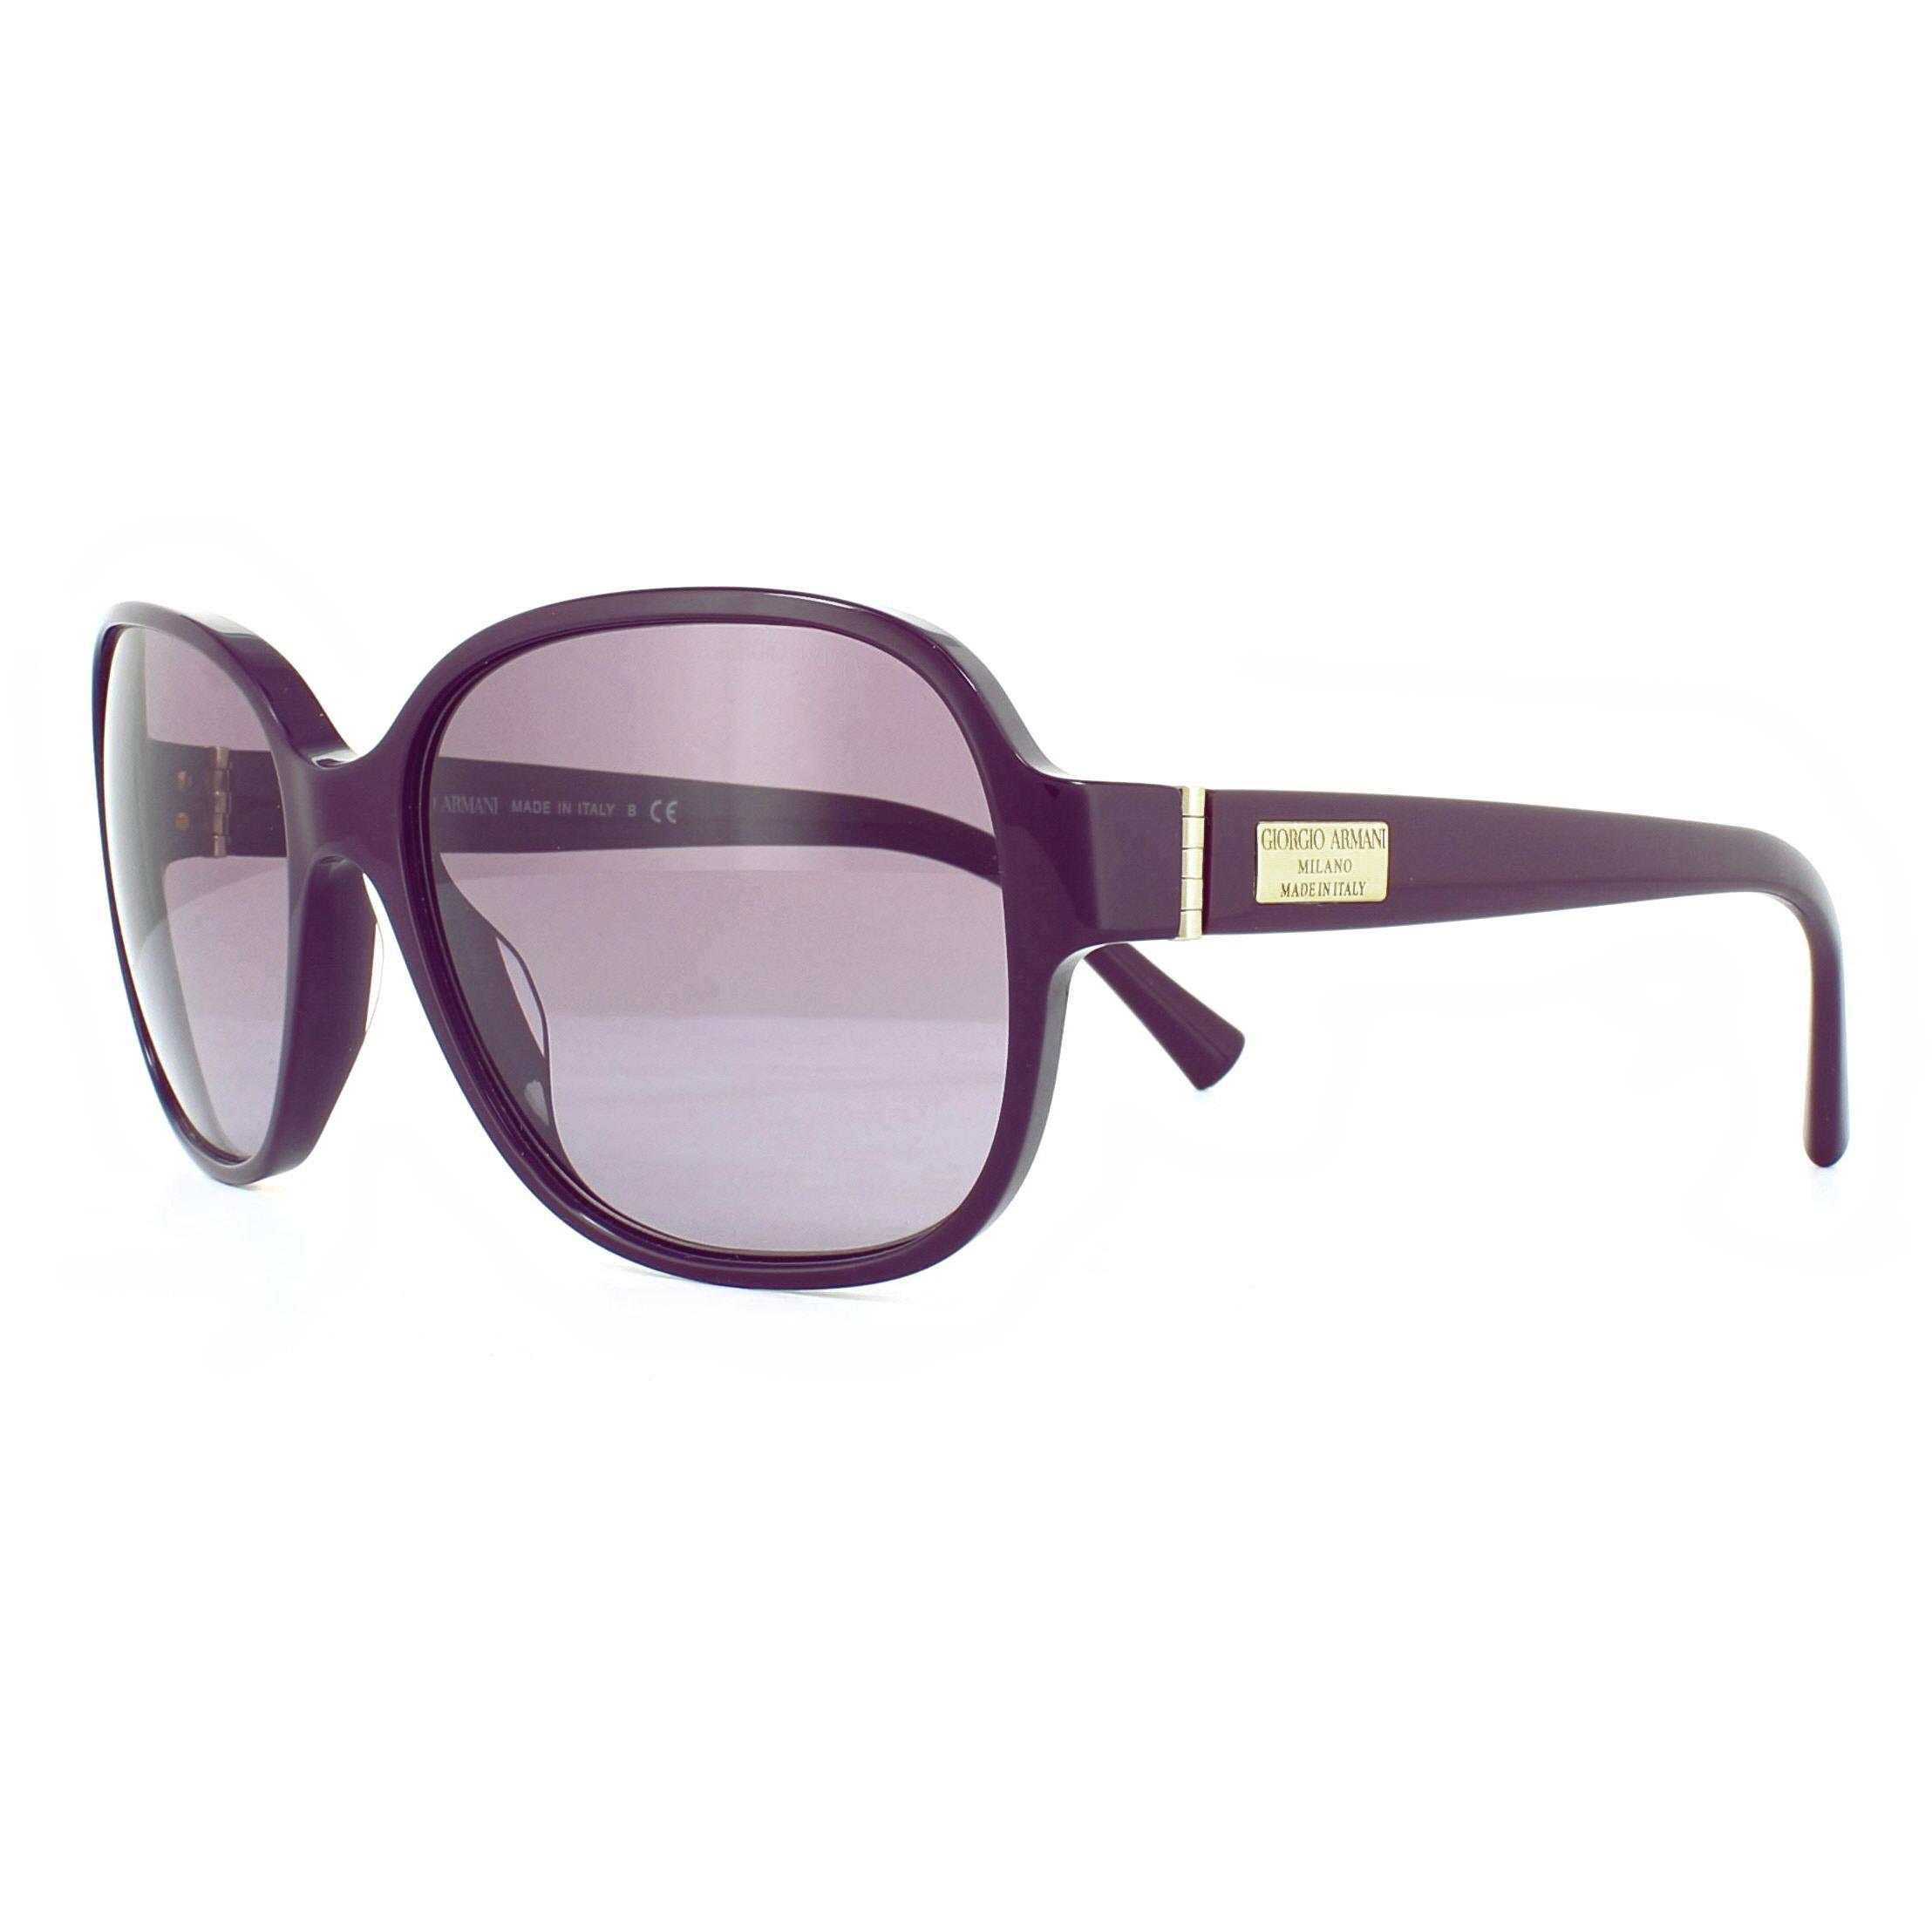 1f15b50f9c7d Sentinel Giorgio Armani Sunglasses AR8020 51158H Purple Purple Gradient